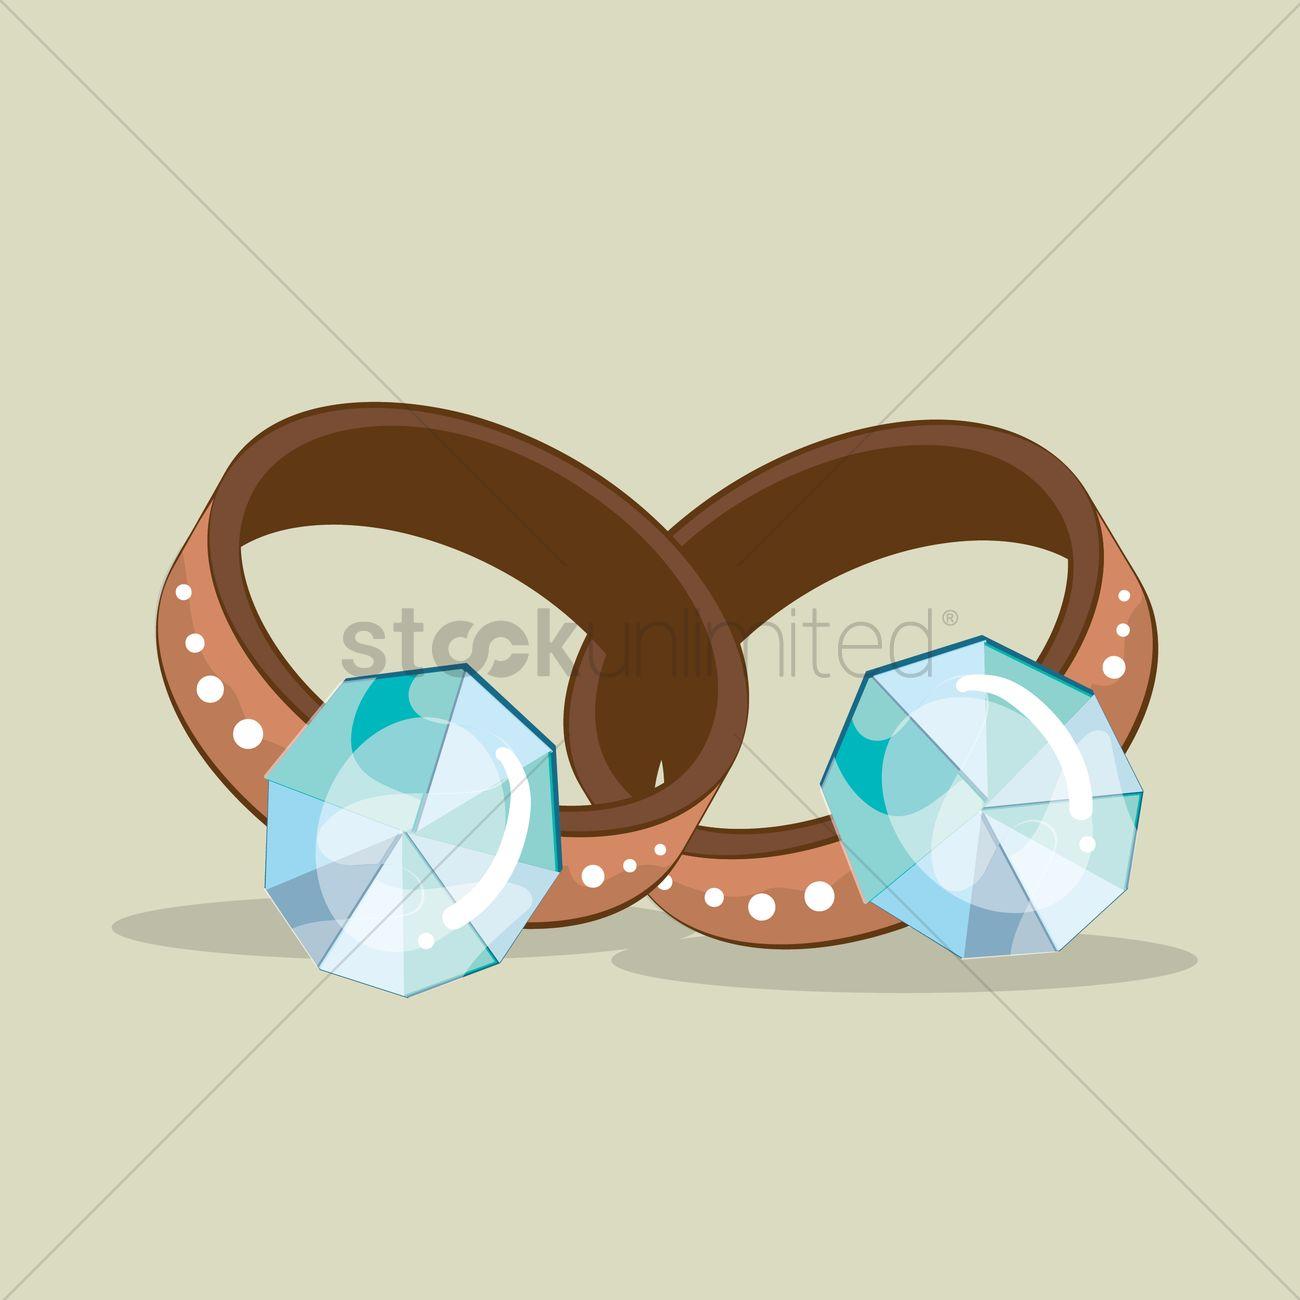 wedding rings vector image - 1327480   stockunlimited